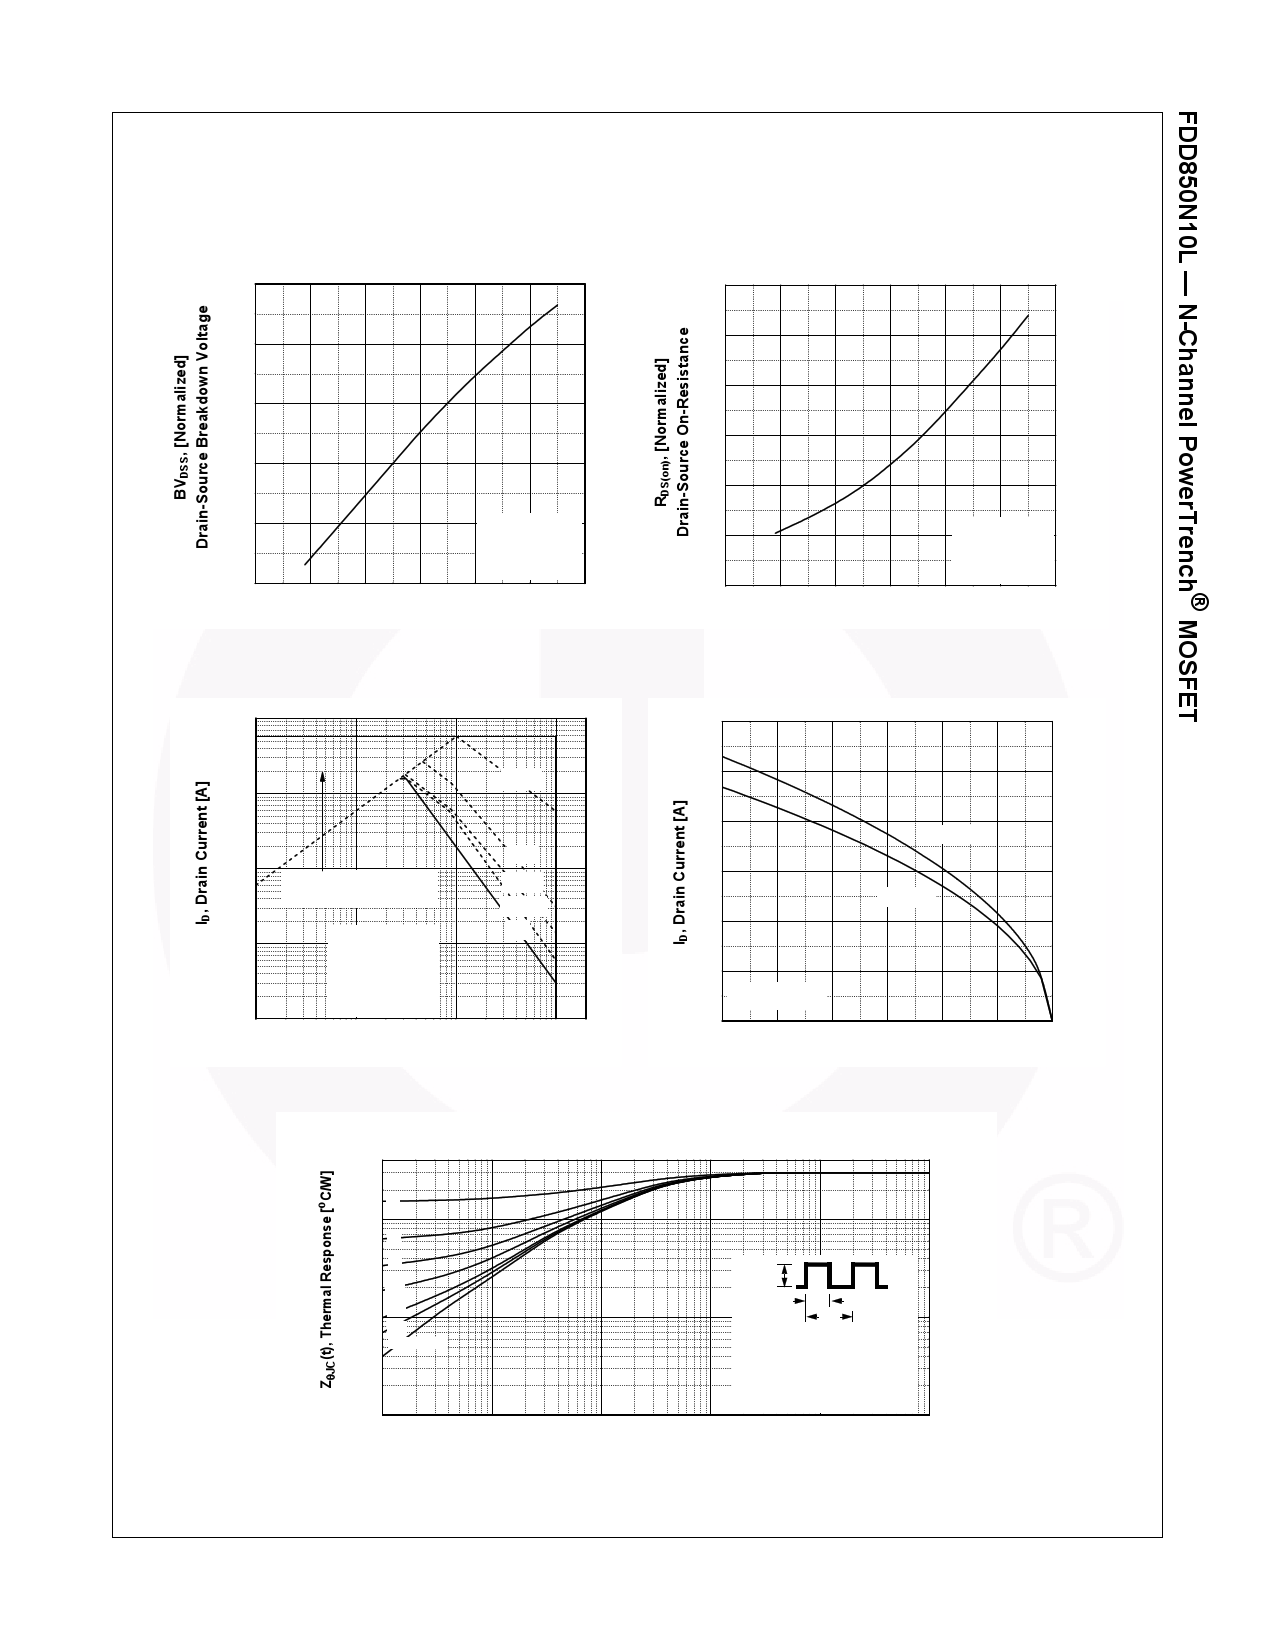 FDD850N10L pdf, 반도체, 판매, 대치품